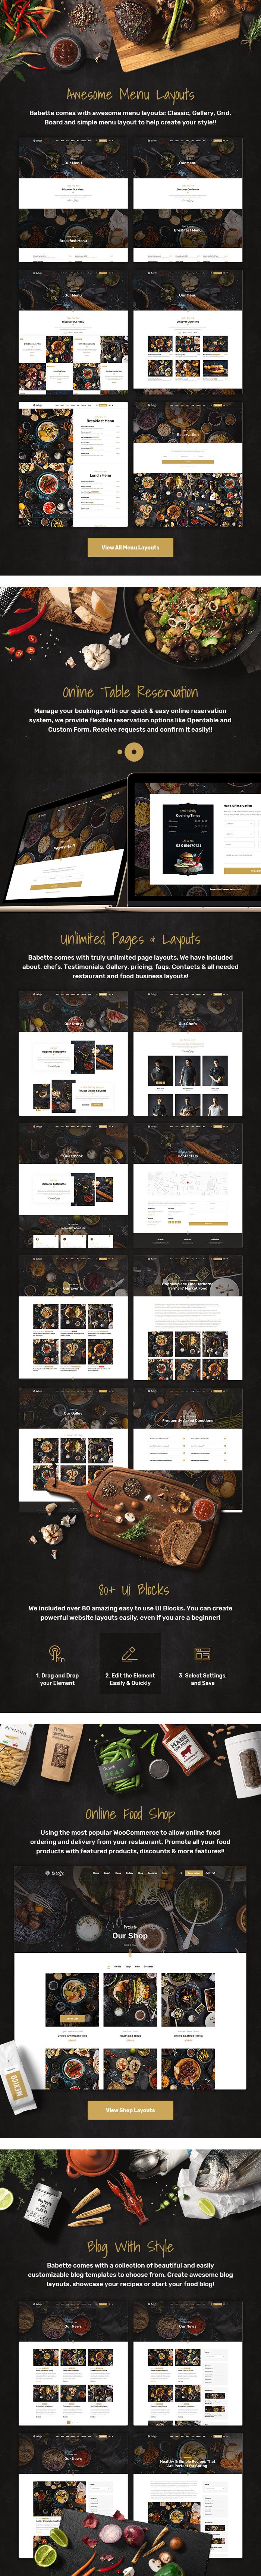 Babette - Restaurant & Cafe HTML5 Template - 3